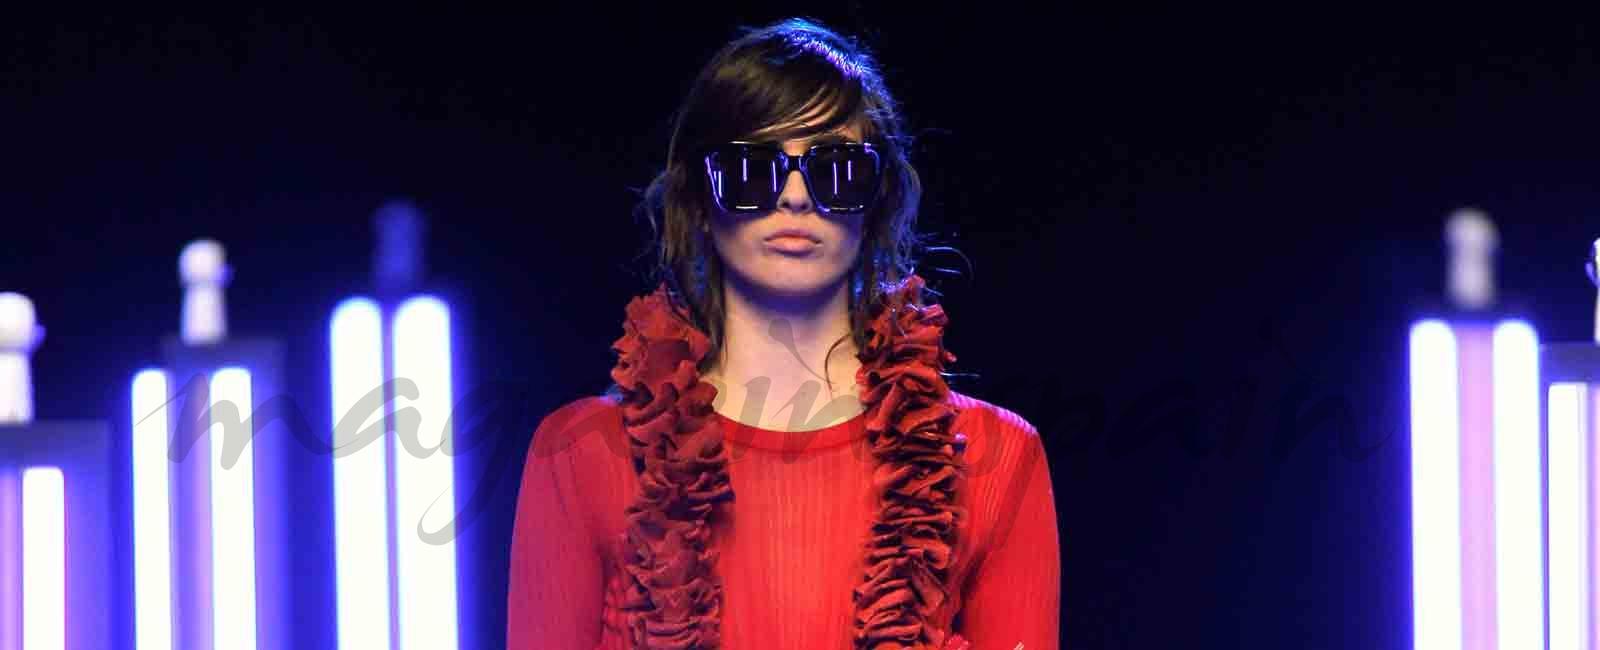 Mercedes Benz Fashion Week: Juan Vidal Primavera Verano 2018